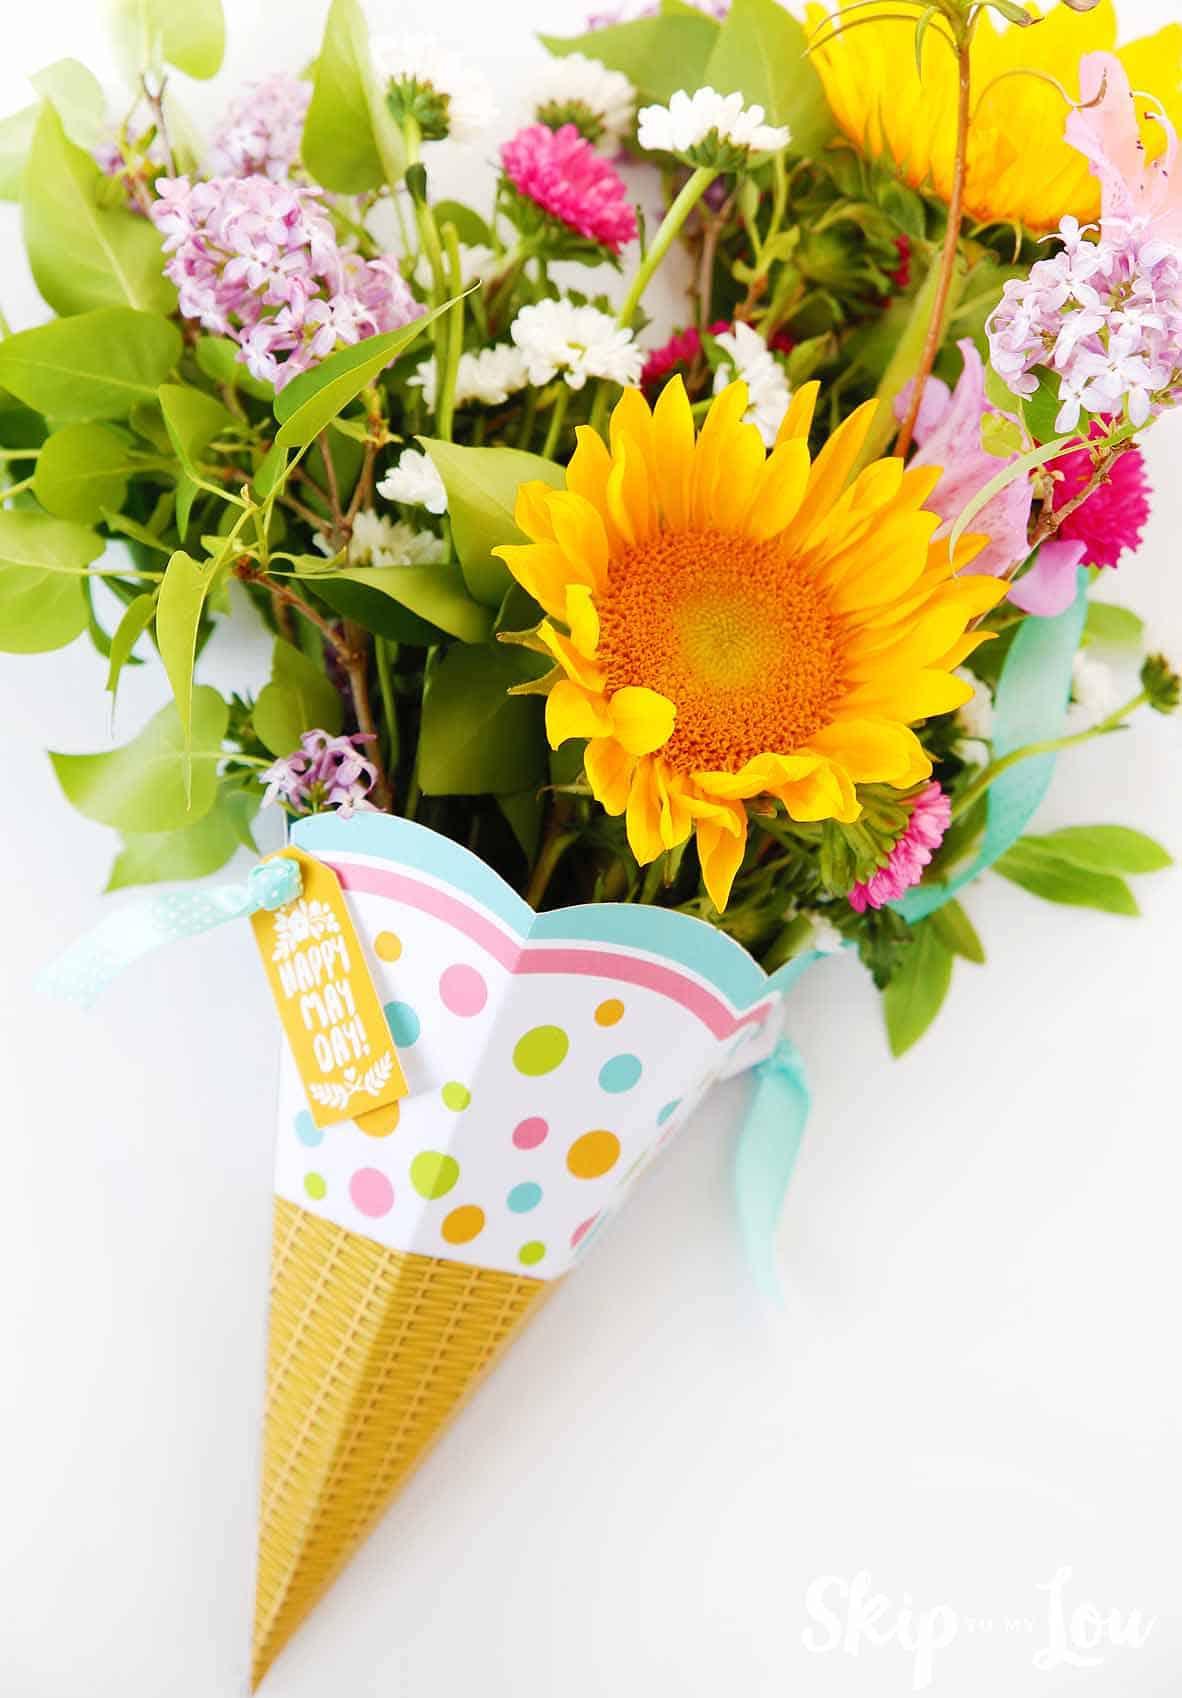 Free Printable May Day Basket | Skip To My Lou